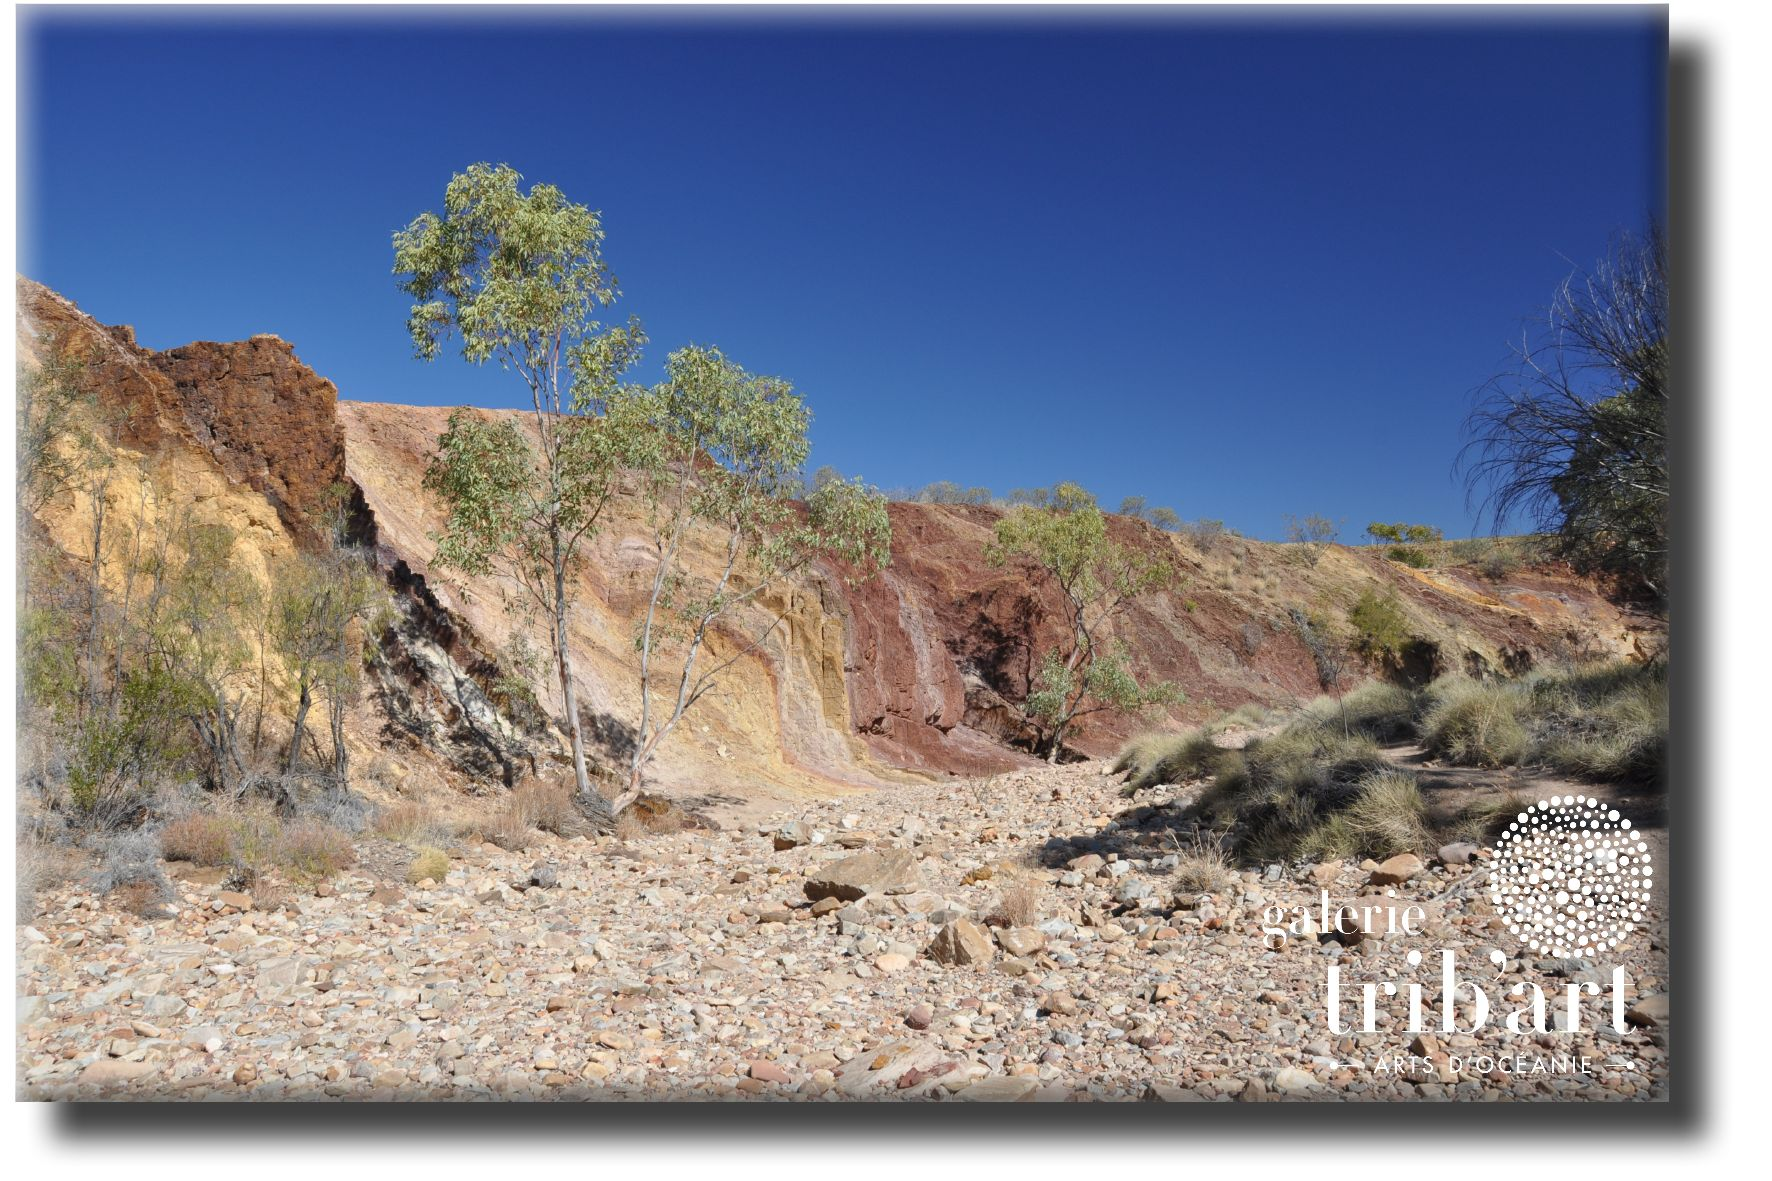 Ochre Pits Australie (page 1)